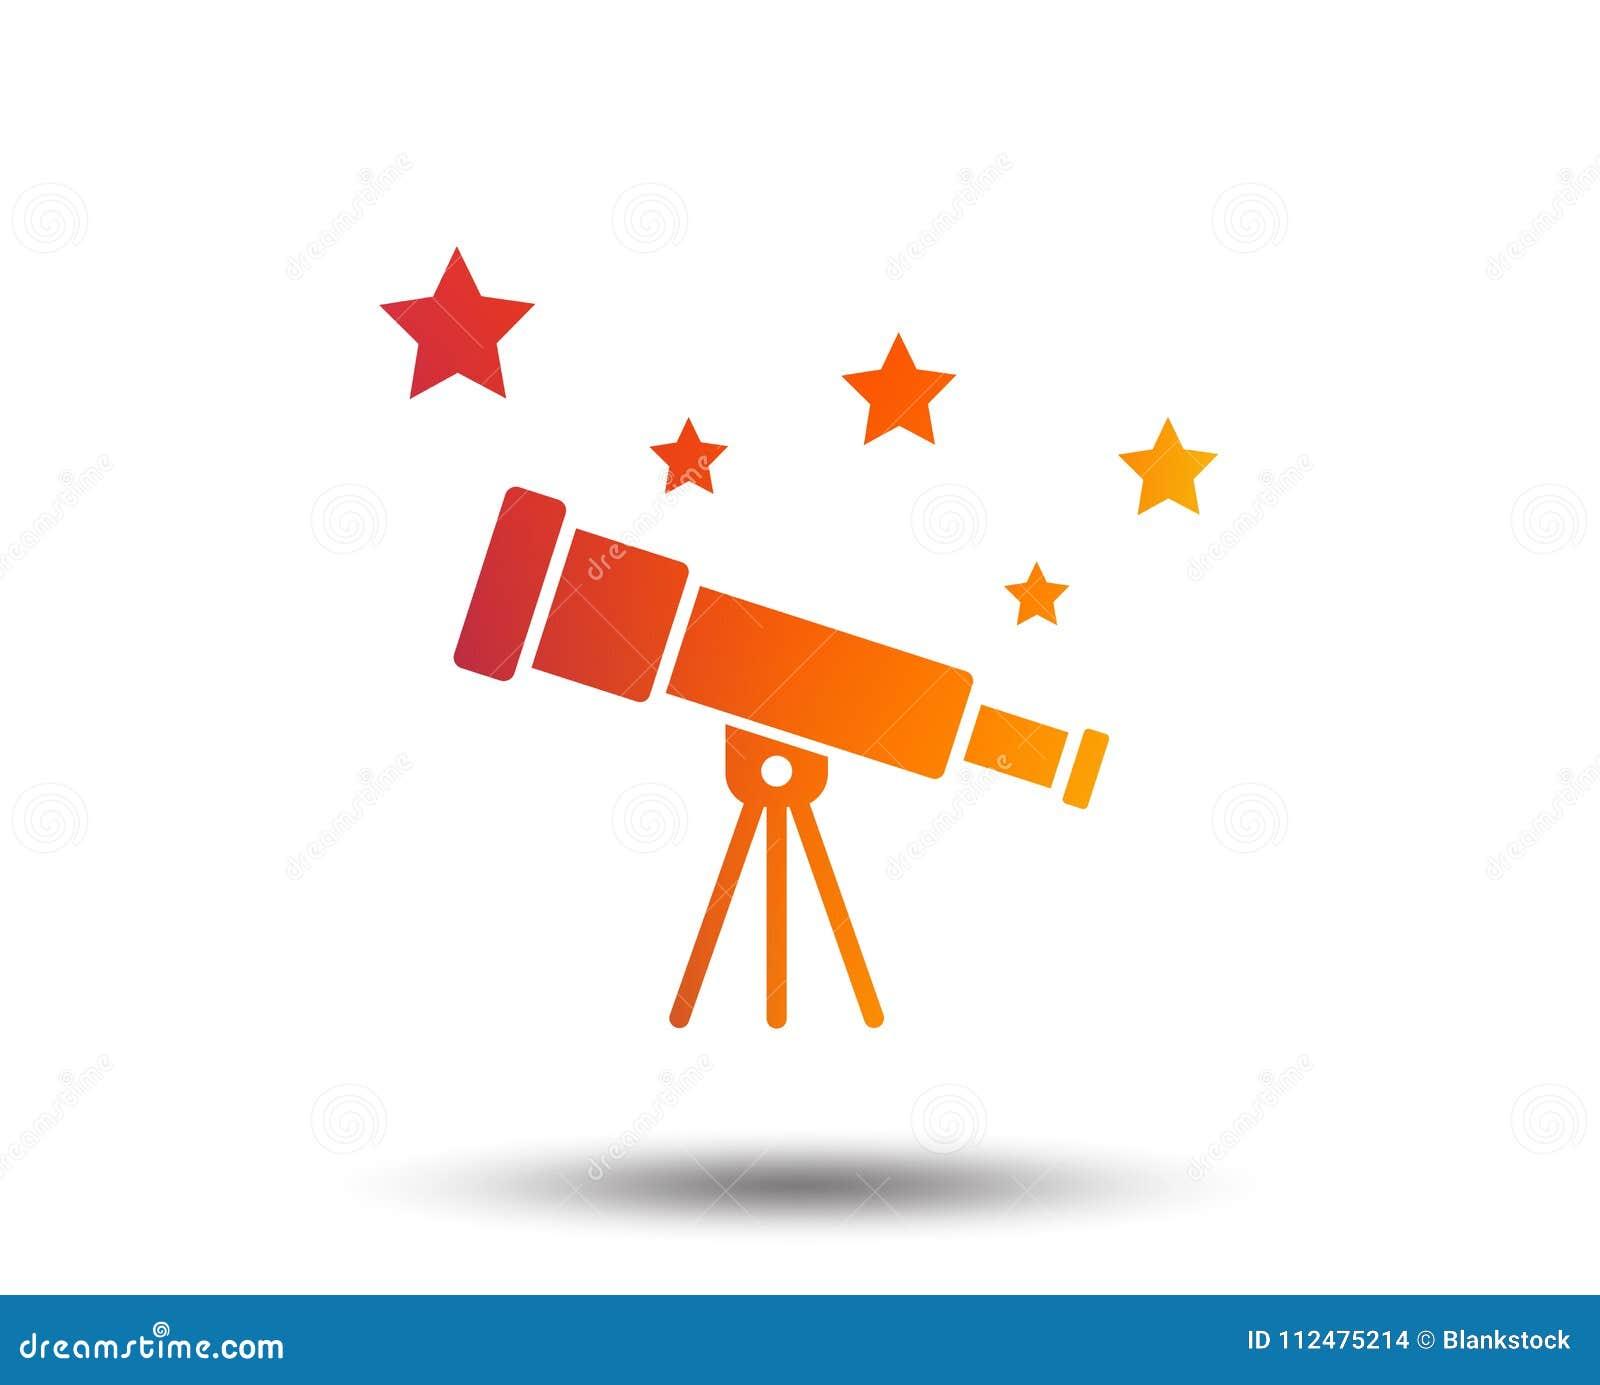 Telescope Icon  Spyglass Tool Symbol  Stock Vector - Illustration of